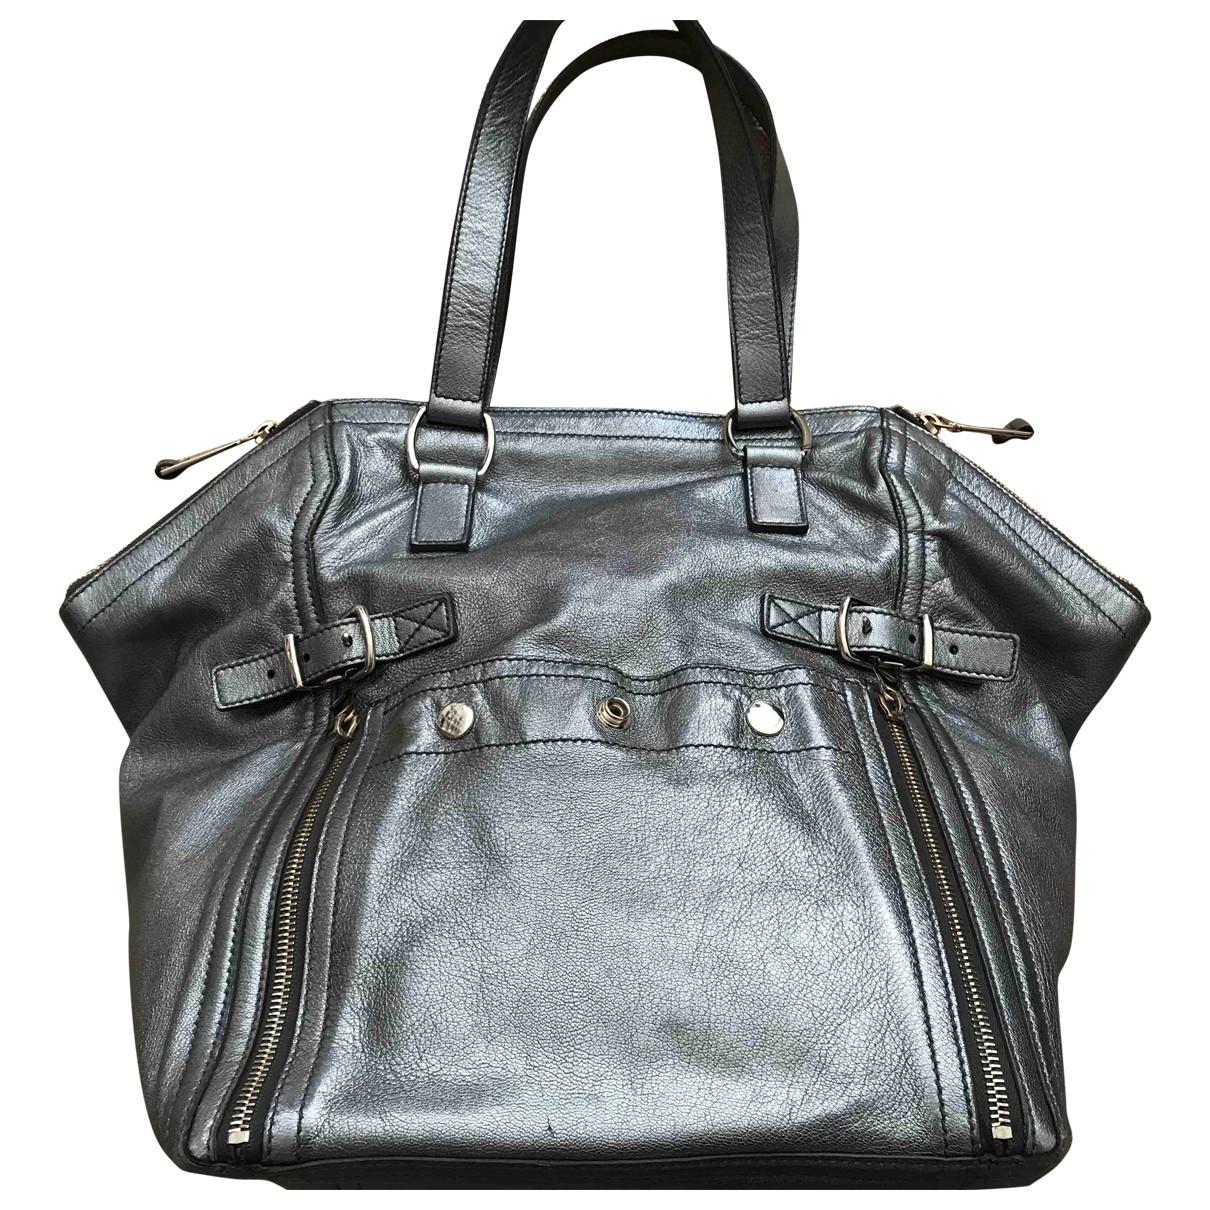 Yves Saint Laurent Downtown Metallic Leather handbag for Women \N